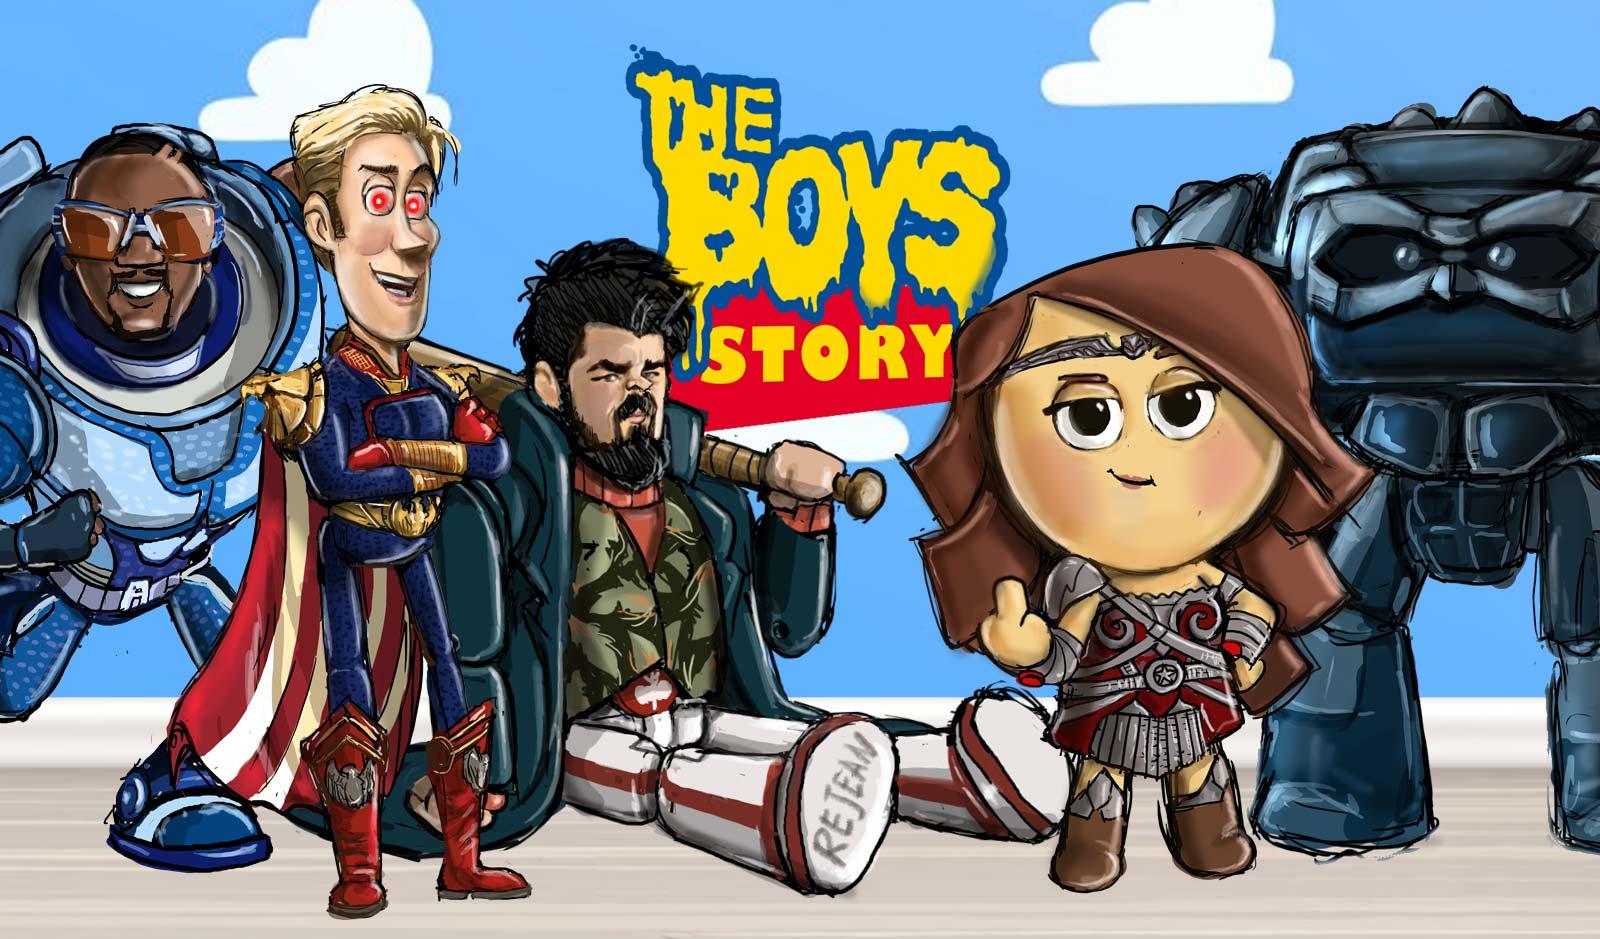 The Boys Story / Illustratie & concept